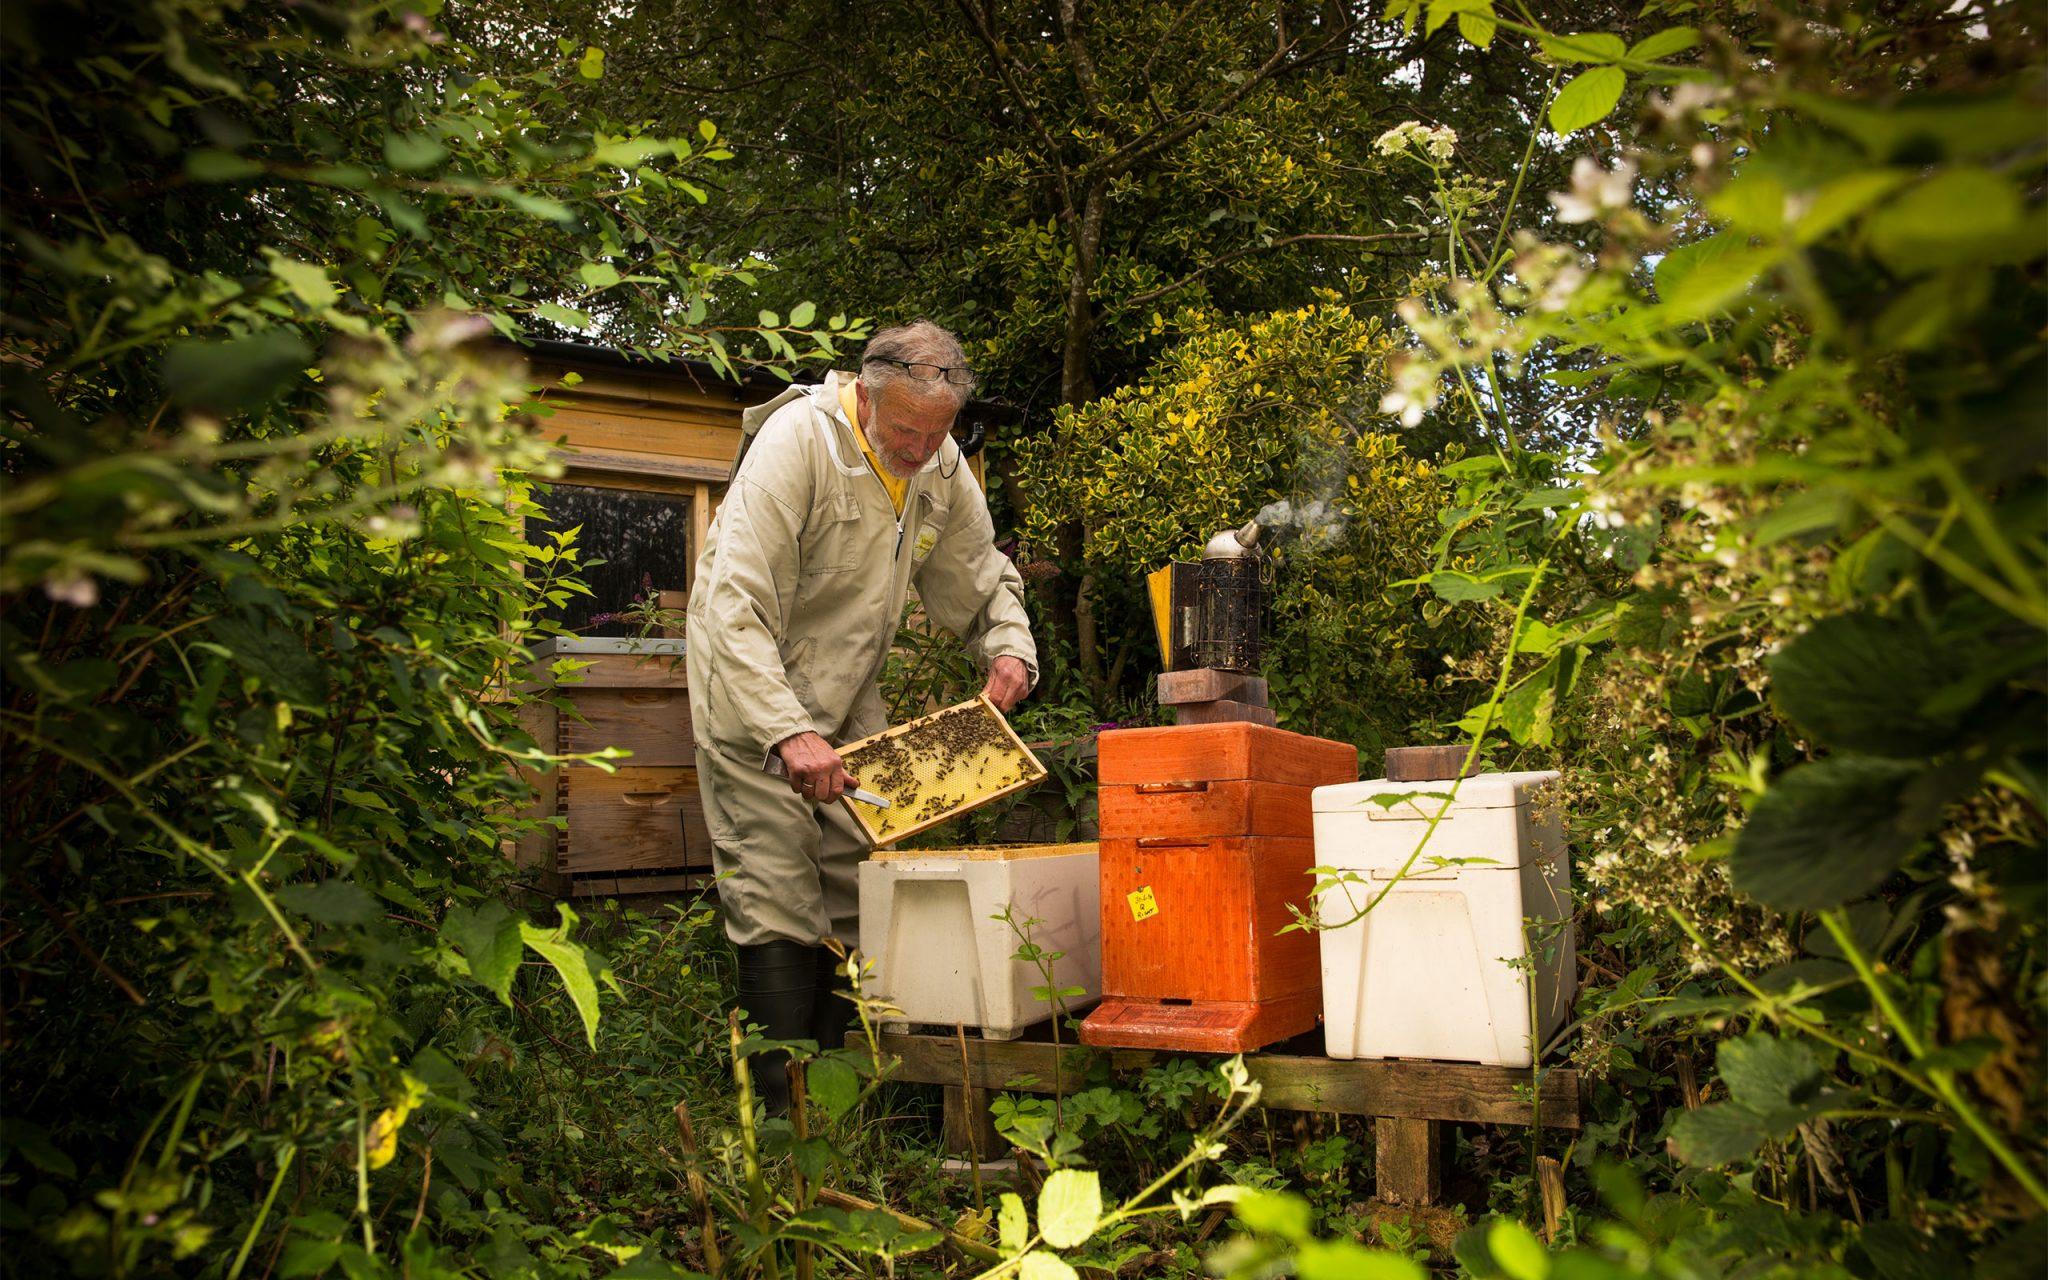 Peter Hunt, Beekeeper in his apiary at Blackaller-Bees, Dartmoor Wild Flower Honey